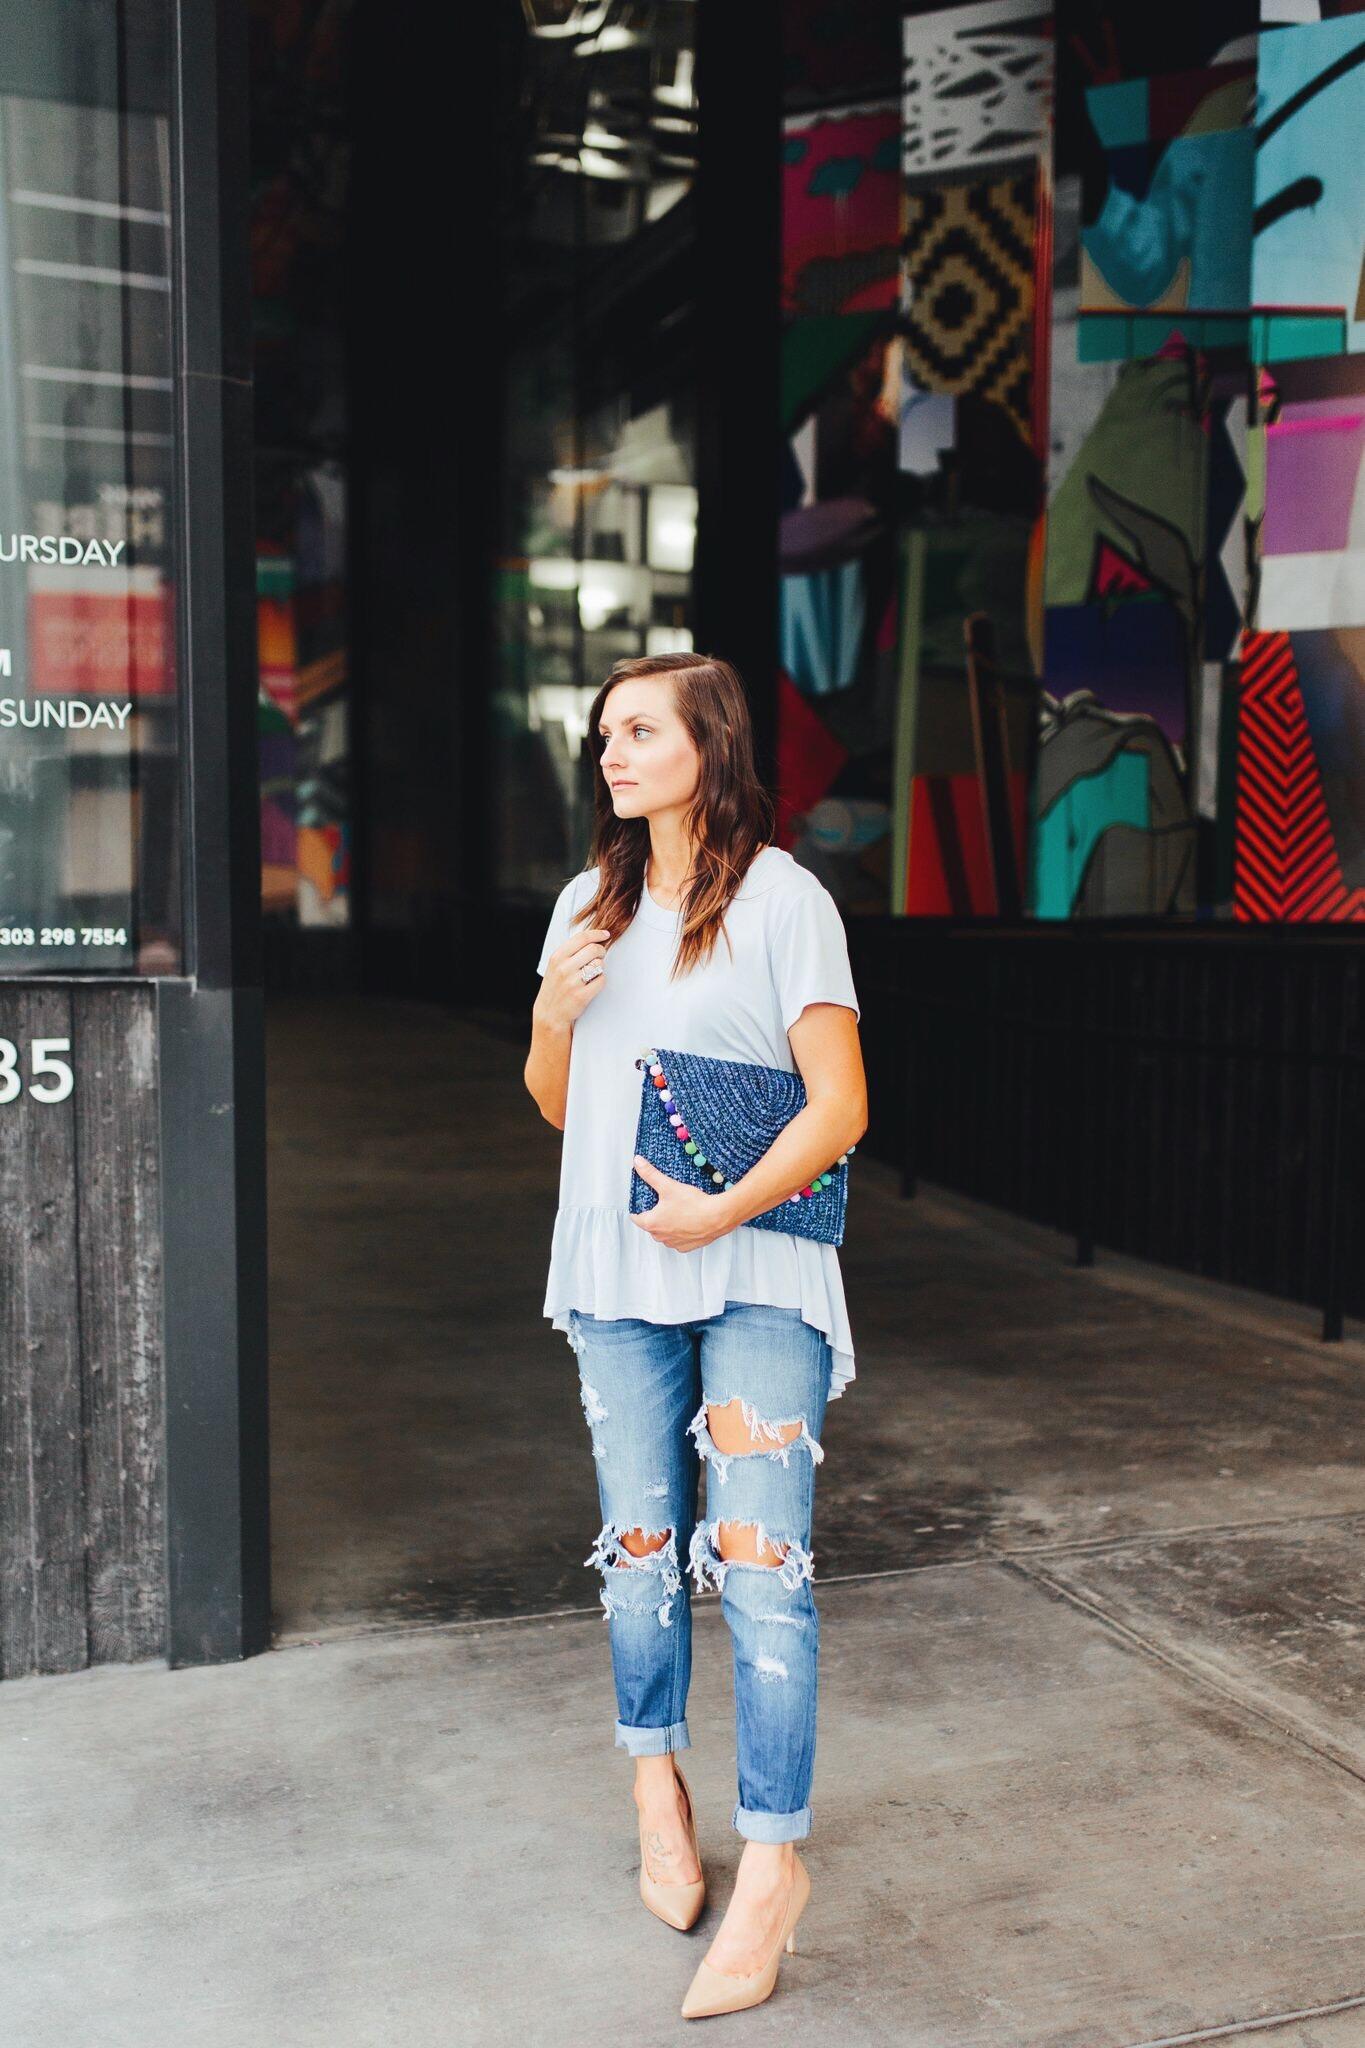 "<img src =""how-to-wear-boyfriend-jeans.jpg"" alt = ""fashion-blogger-teddybearsandlipstick-in-downtown-denver-holding-a-blue-clutch-with-colorful-pompoms-wearing-boyfriend-jenas-sam-edelman-hazel-pumps-a-blue-peplum-top"">"